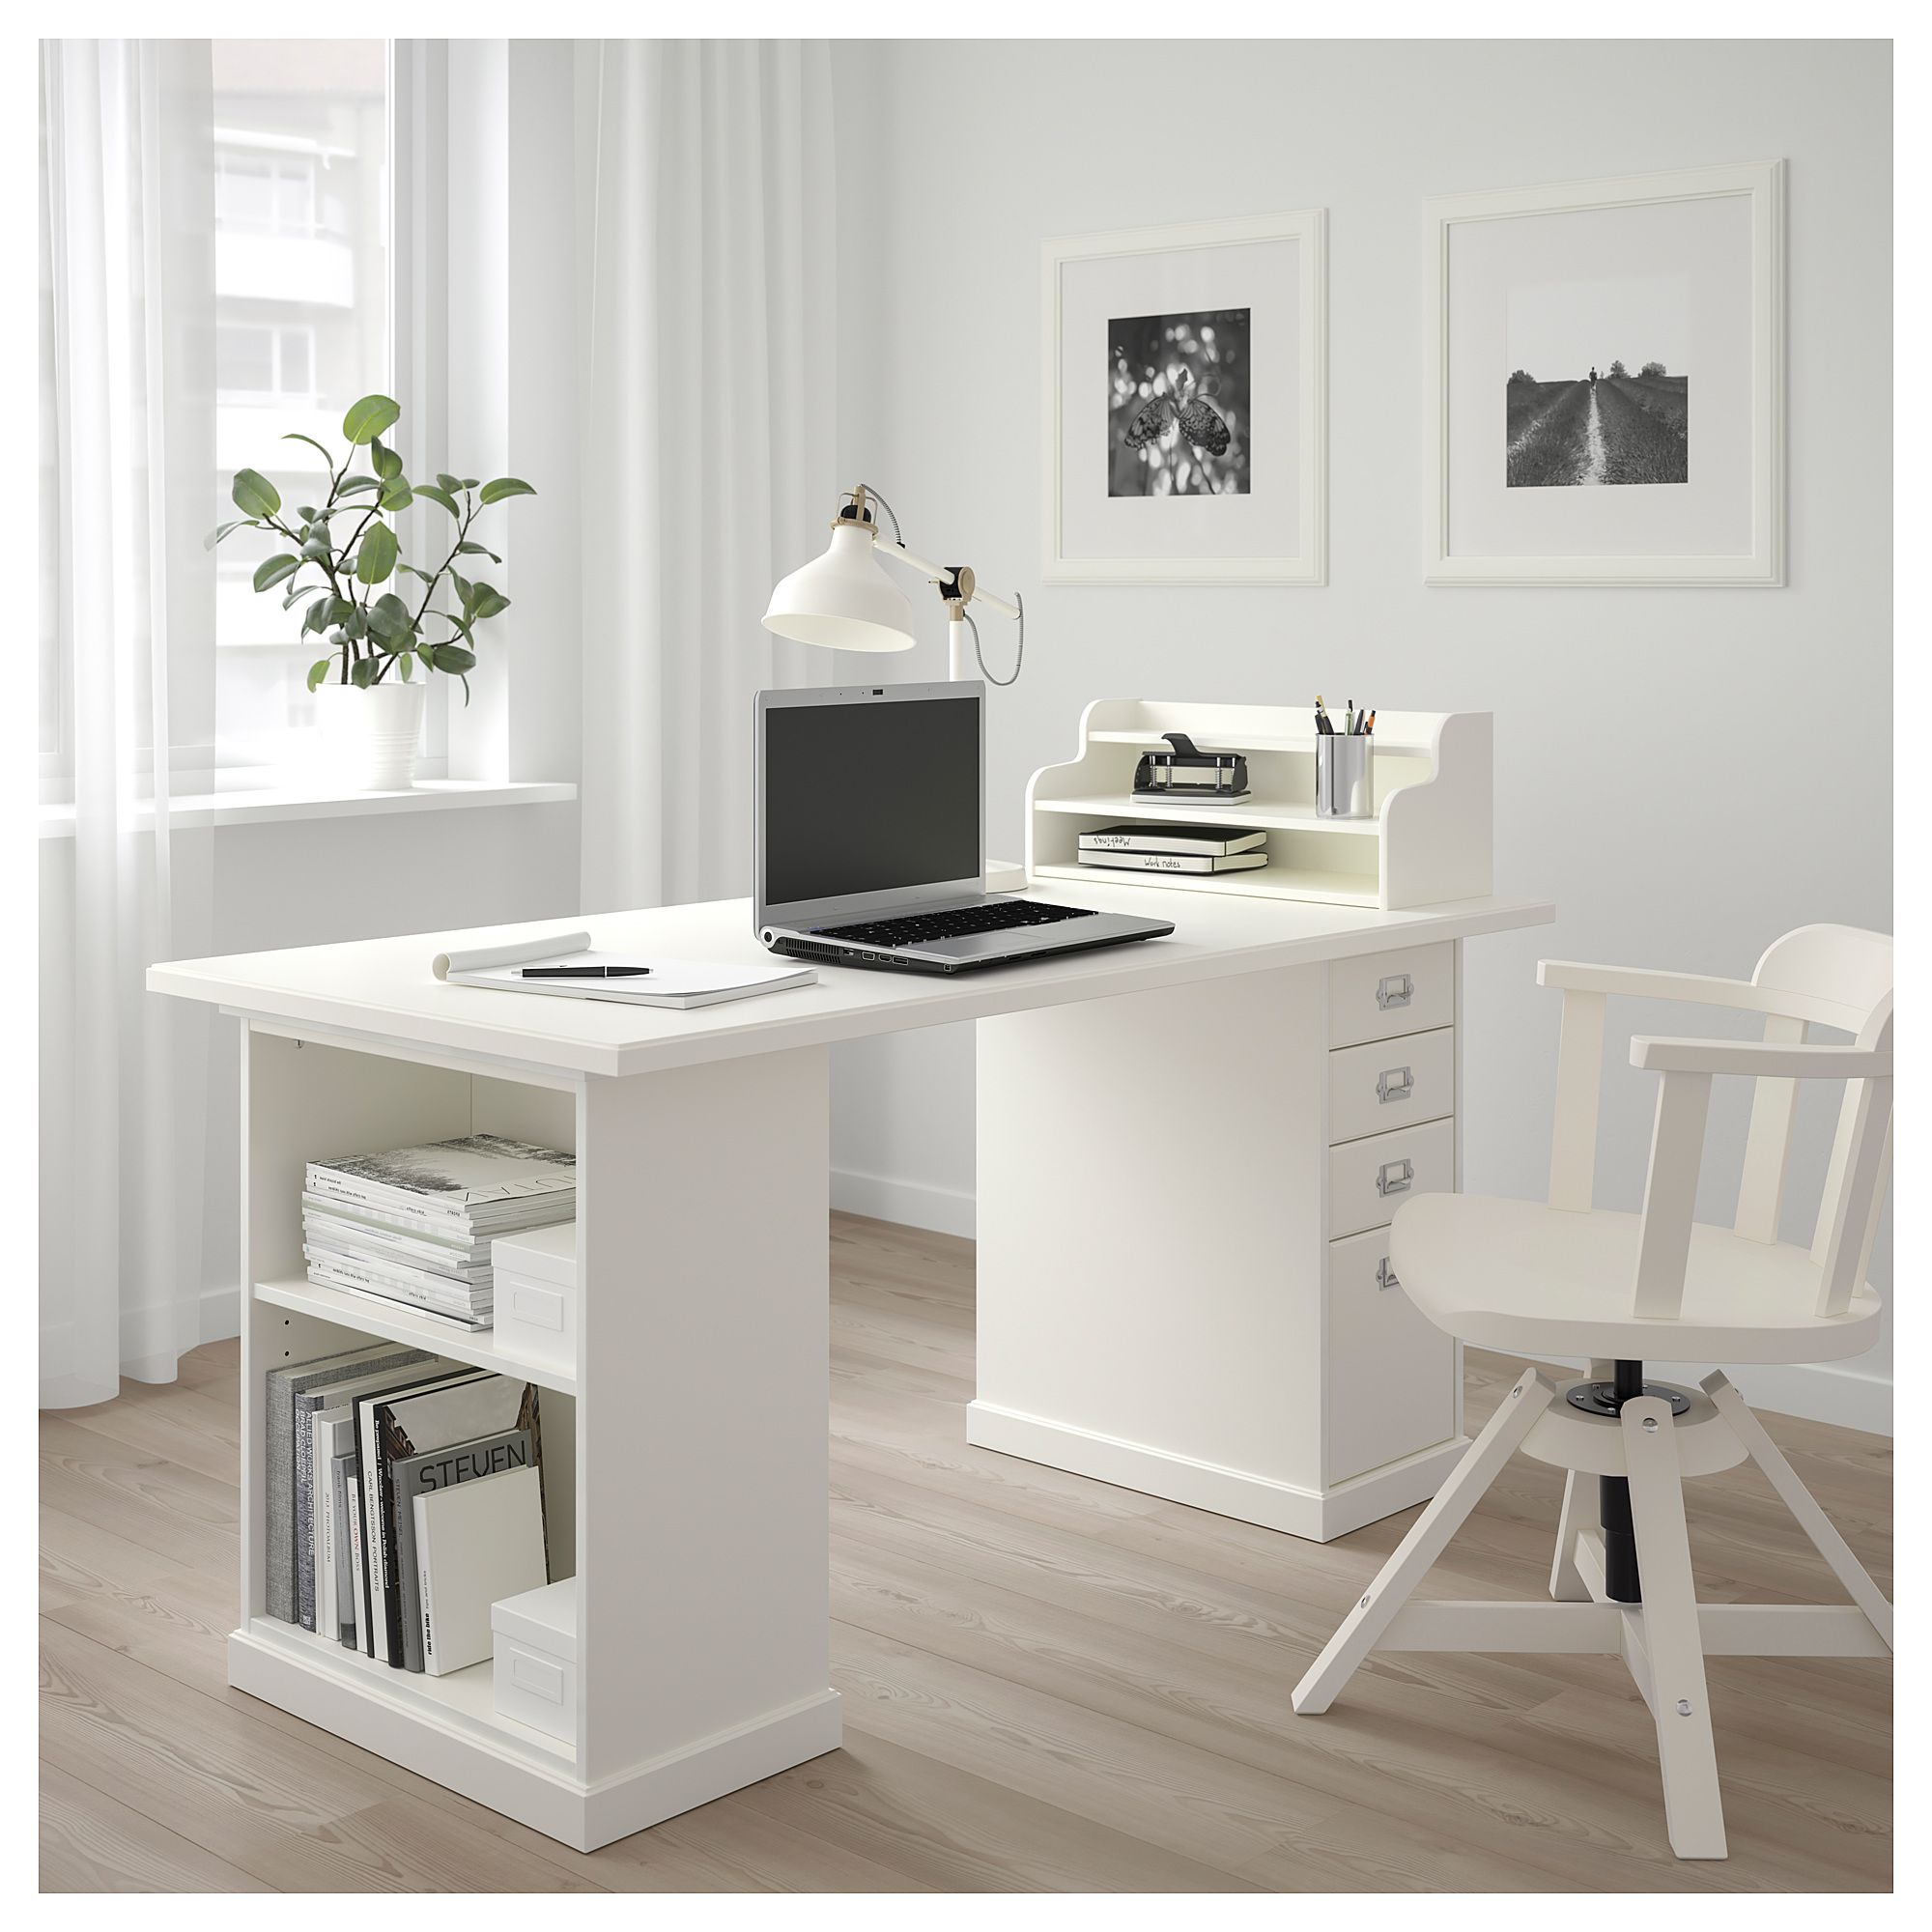 Klimpen Table Gray Light Gray 150x75 Cm Shop Ikea Ca Ikea